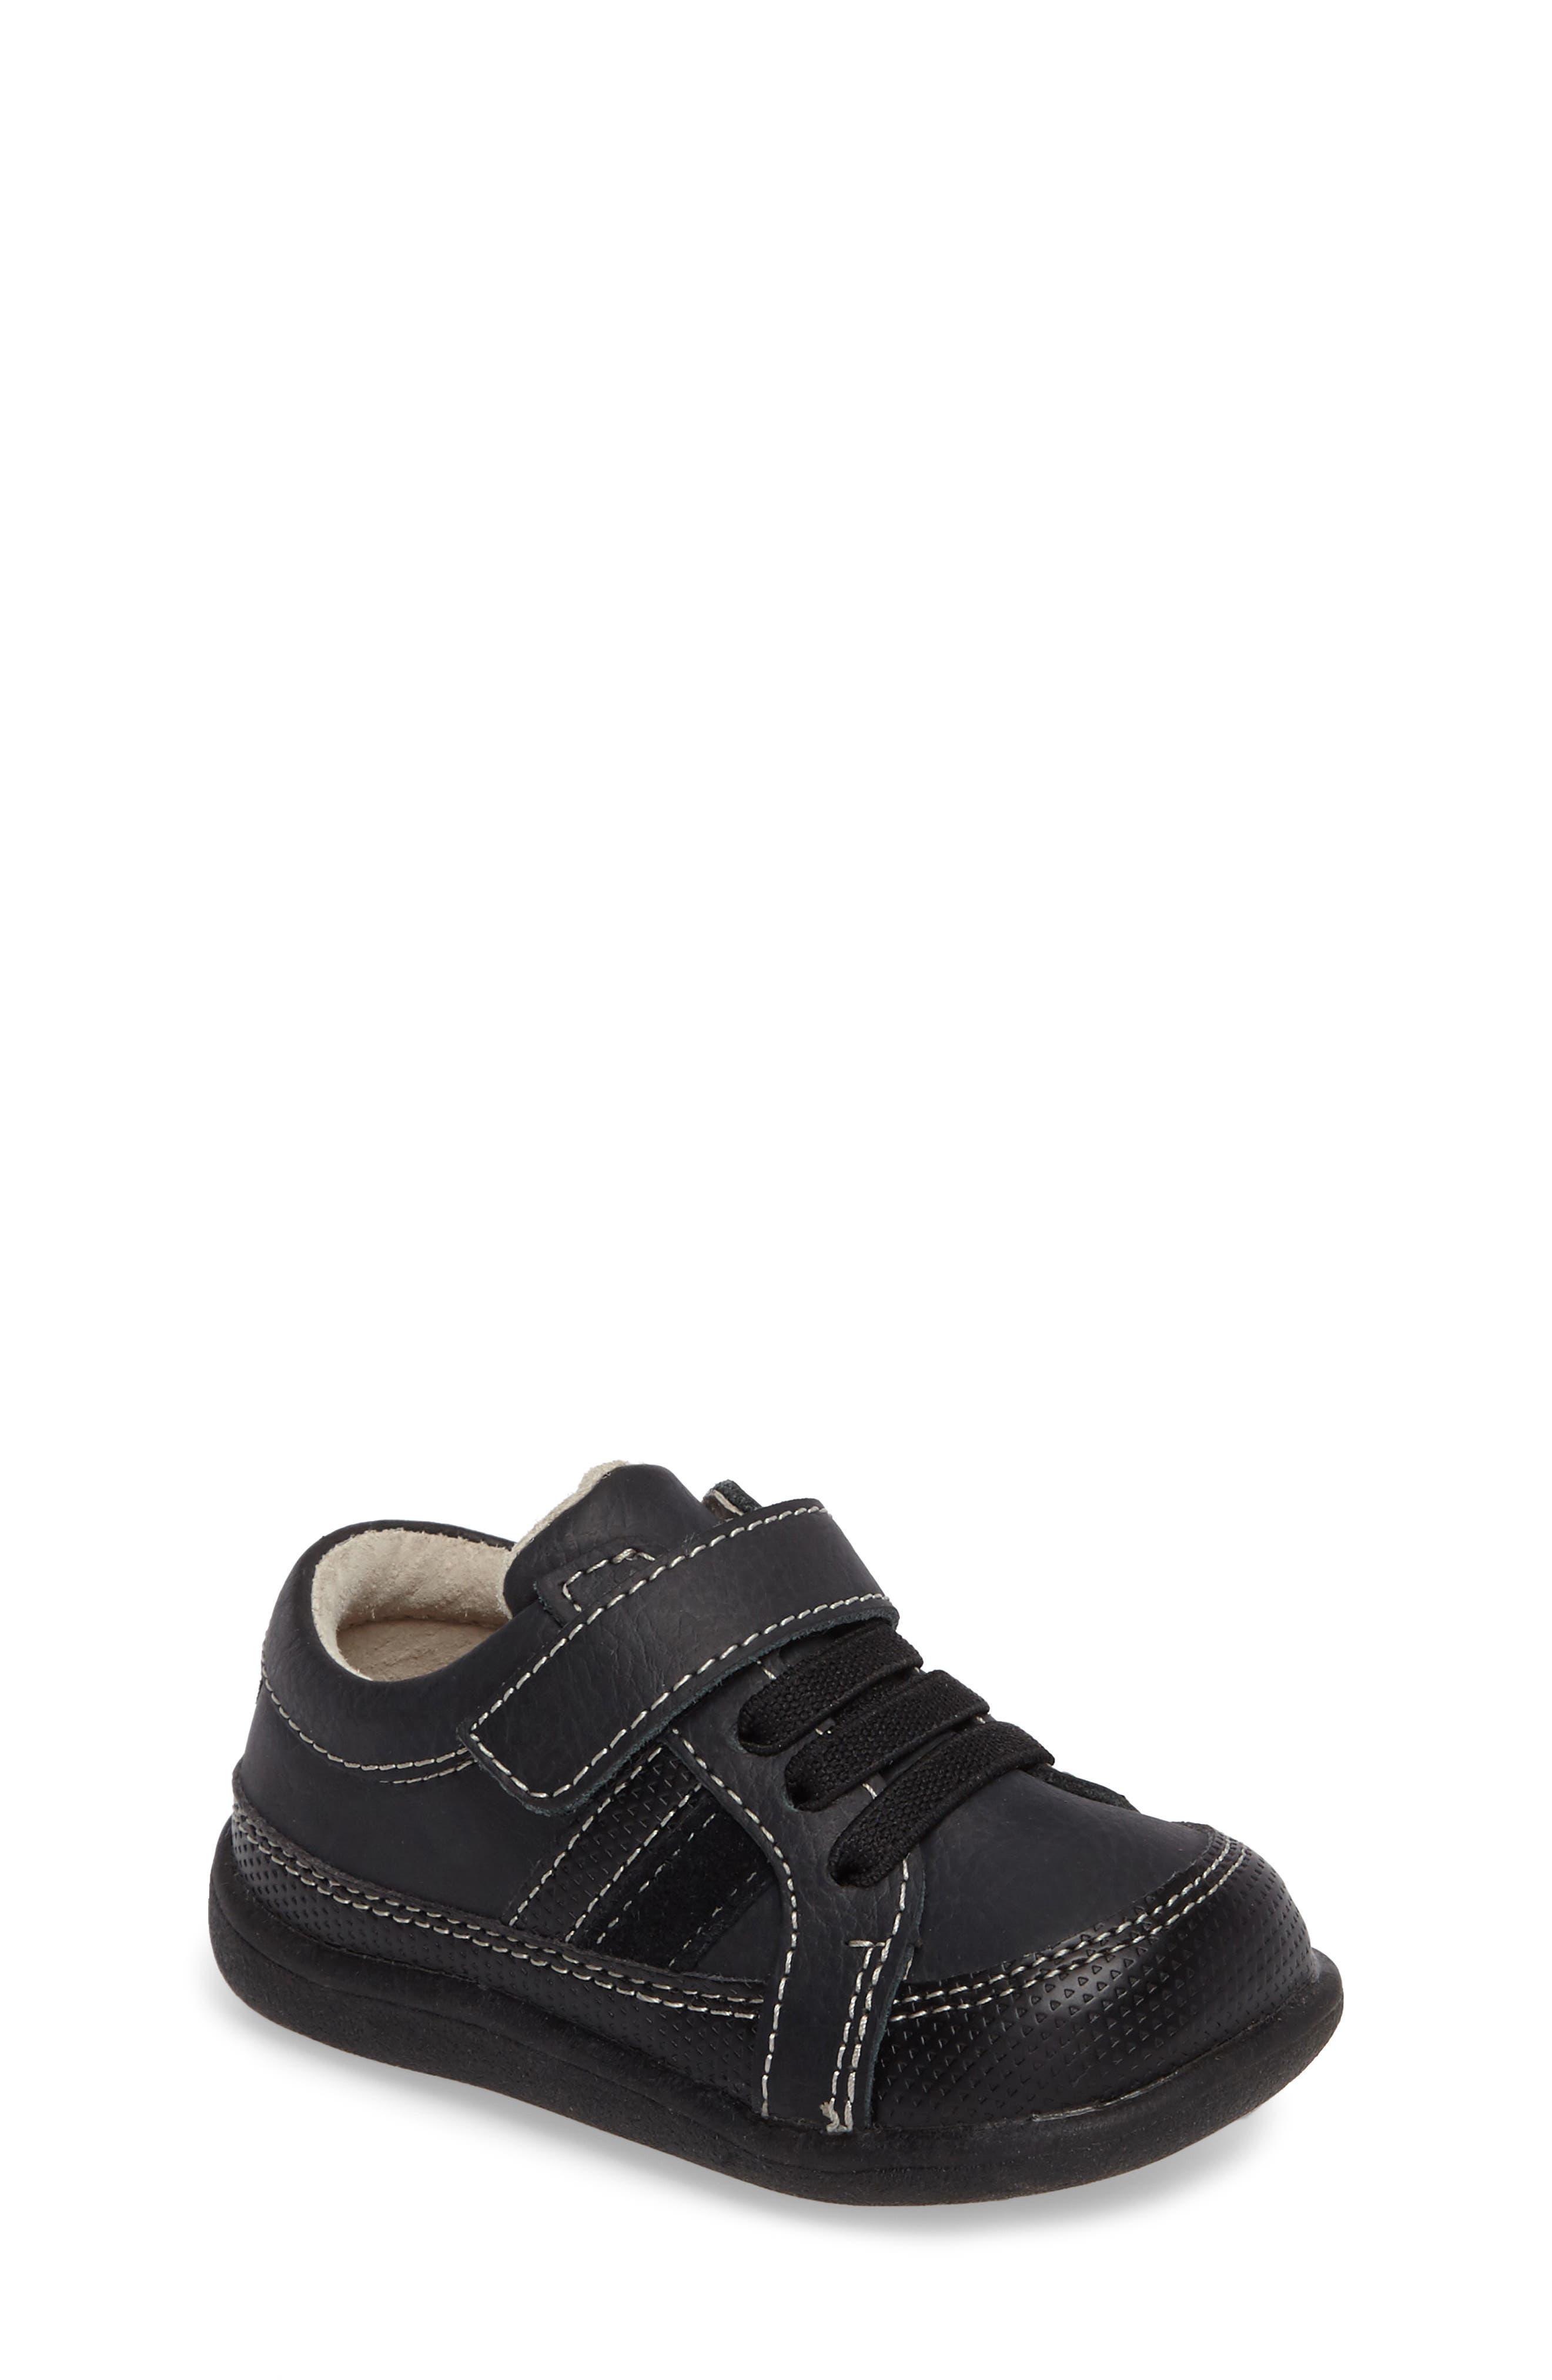 Randall II Sneaker,                             Main thumbnail 1, color,                             Black